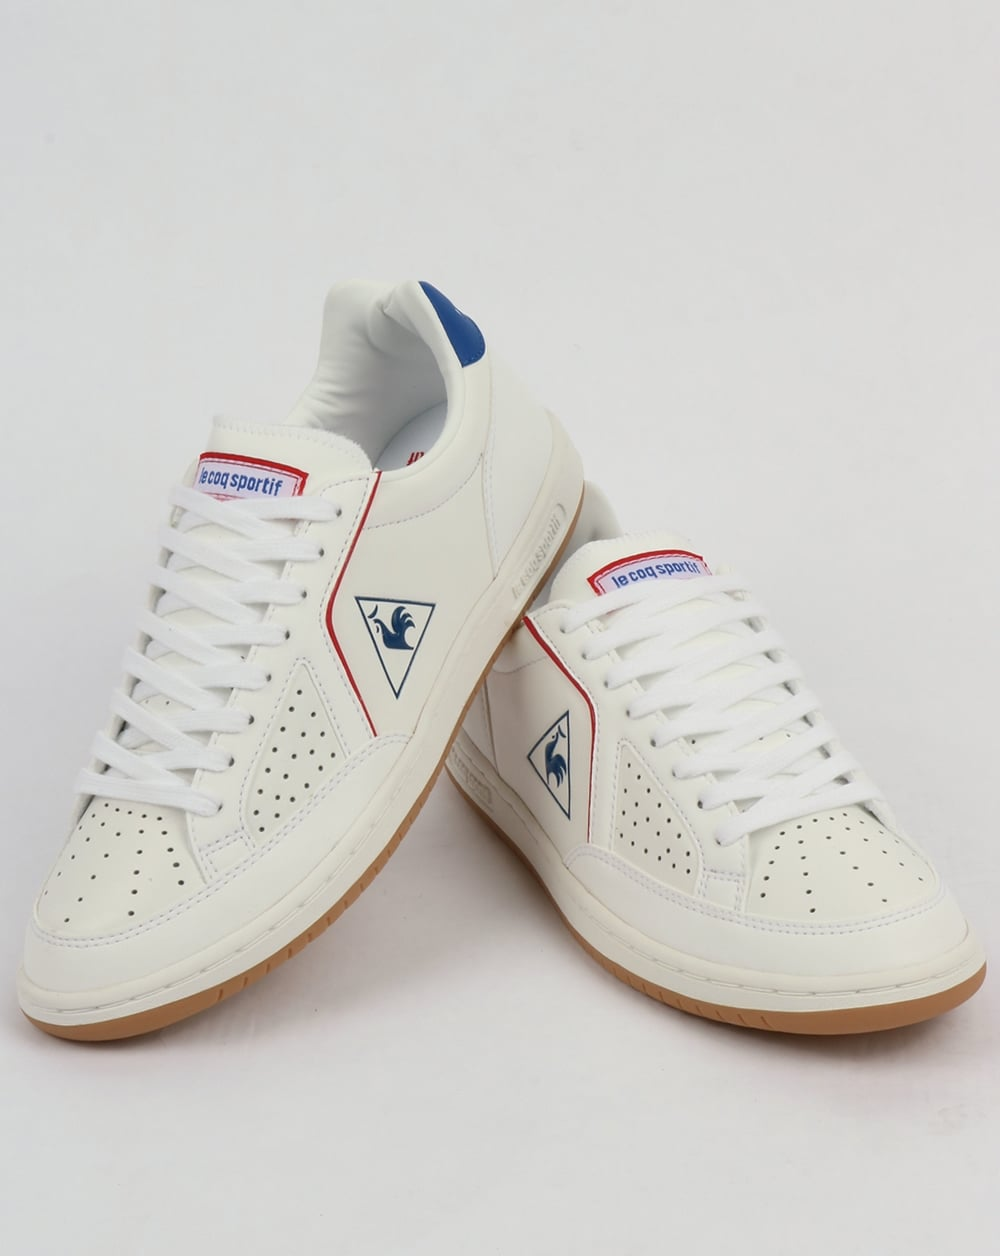 Le Coq Sportif Icons Lea Sport Gum Trainers White